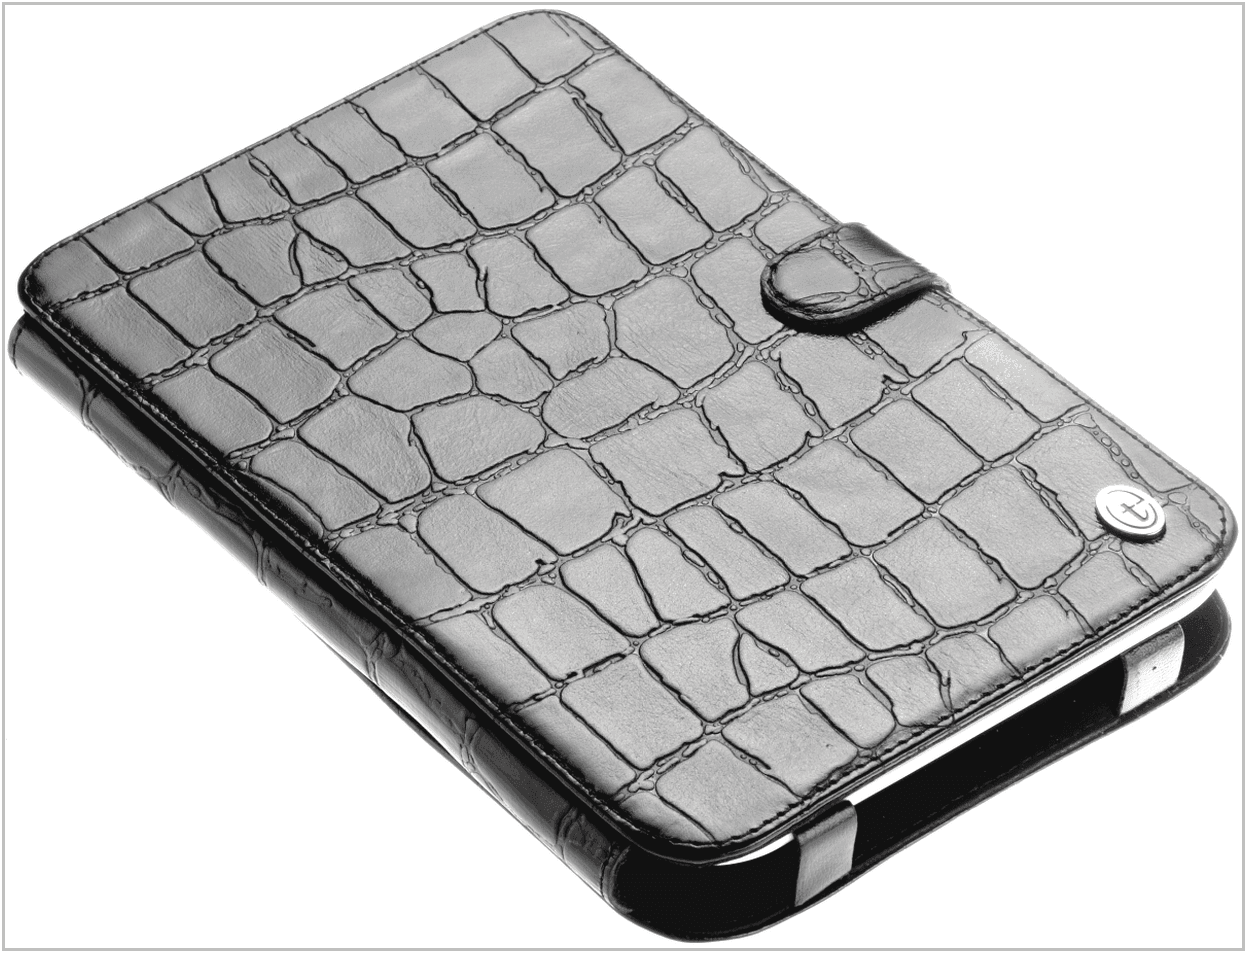 Чехол-обложка для Digma R60G Time размер с крокодил